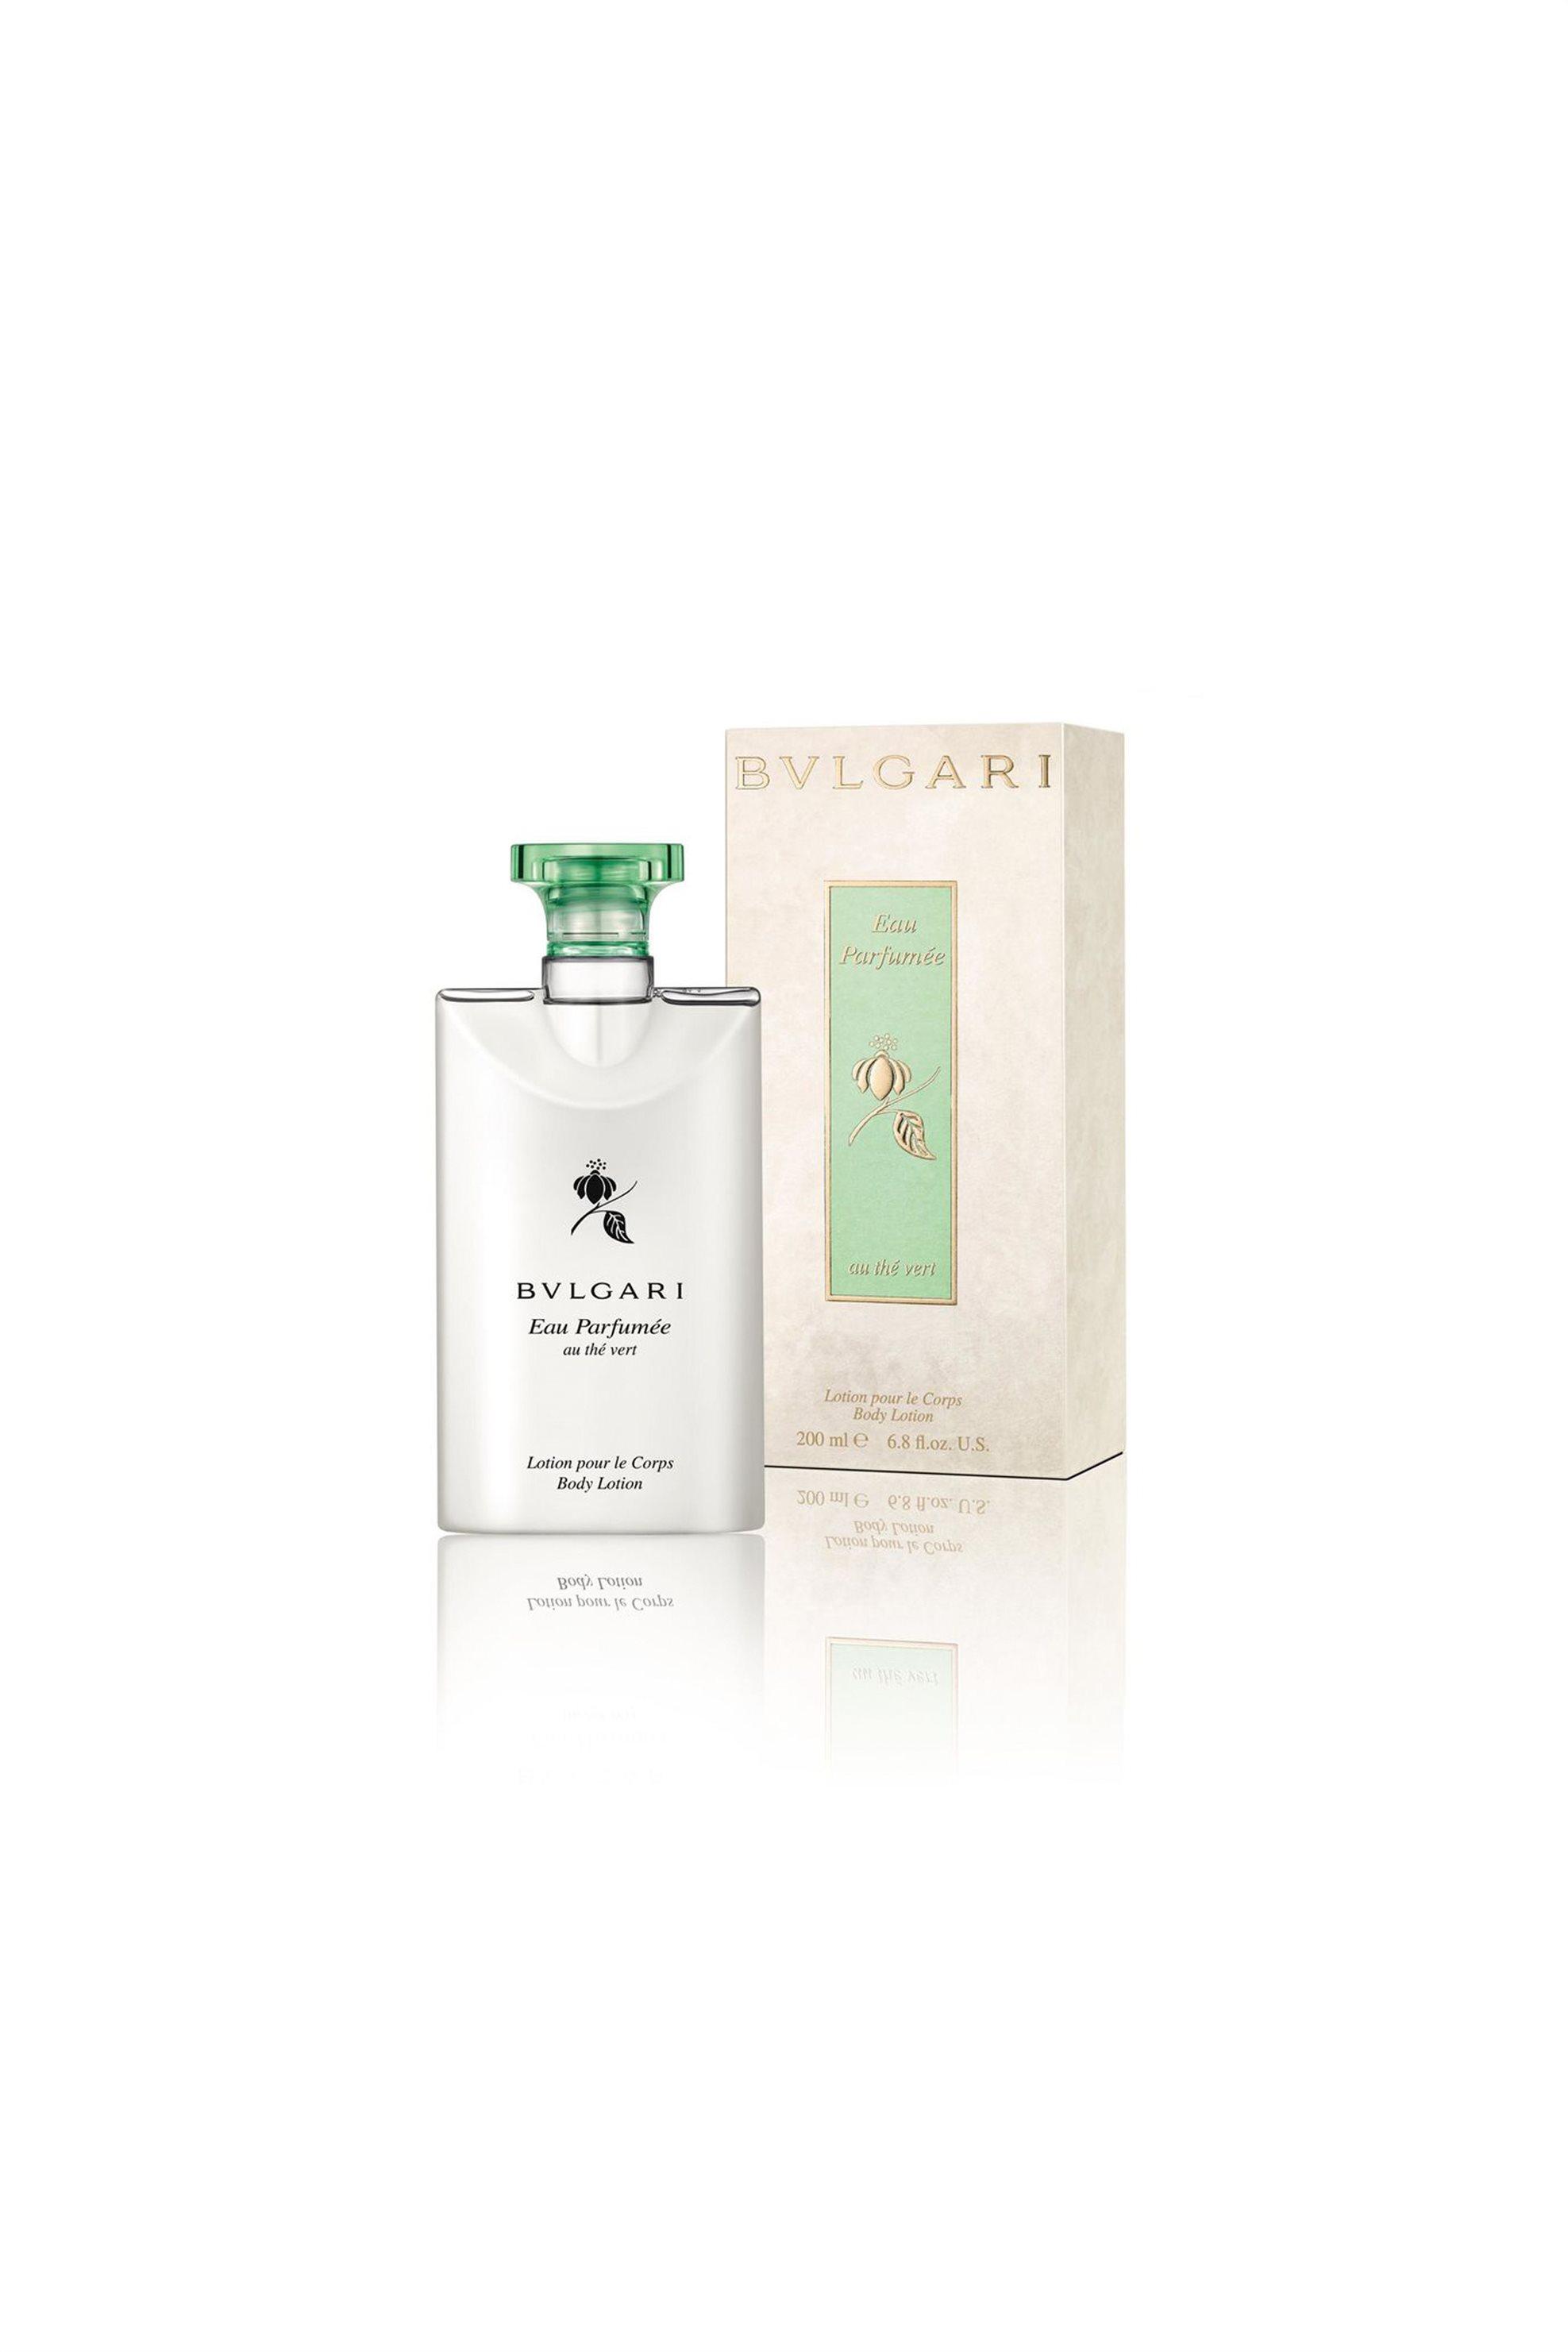 Bvlgari Eau Parfumée au Thé Vert Body Lotion 200 ml - 47193 ομορφια   καλλυντικα επιλεκτικησ   αρώματα   γυναικεία αρώματα   ανδρικά αρώματα